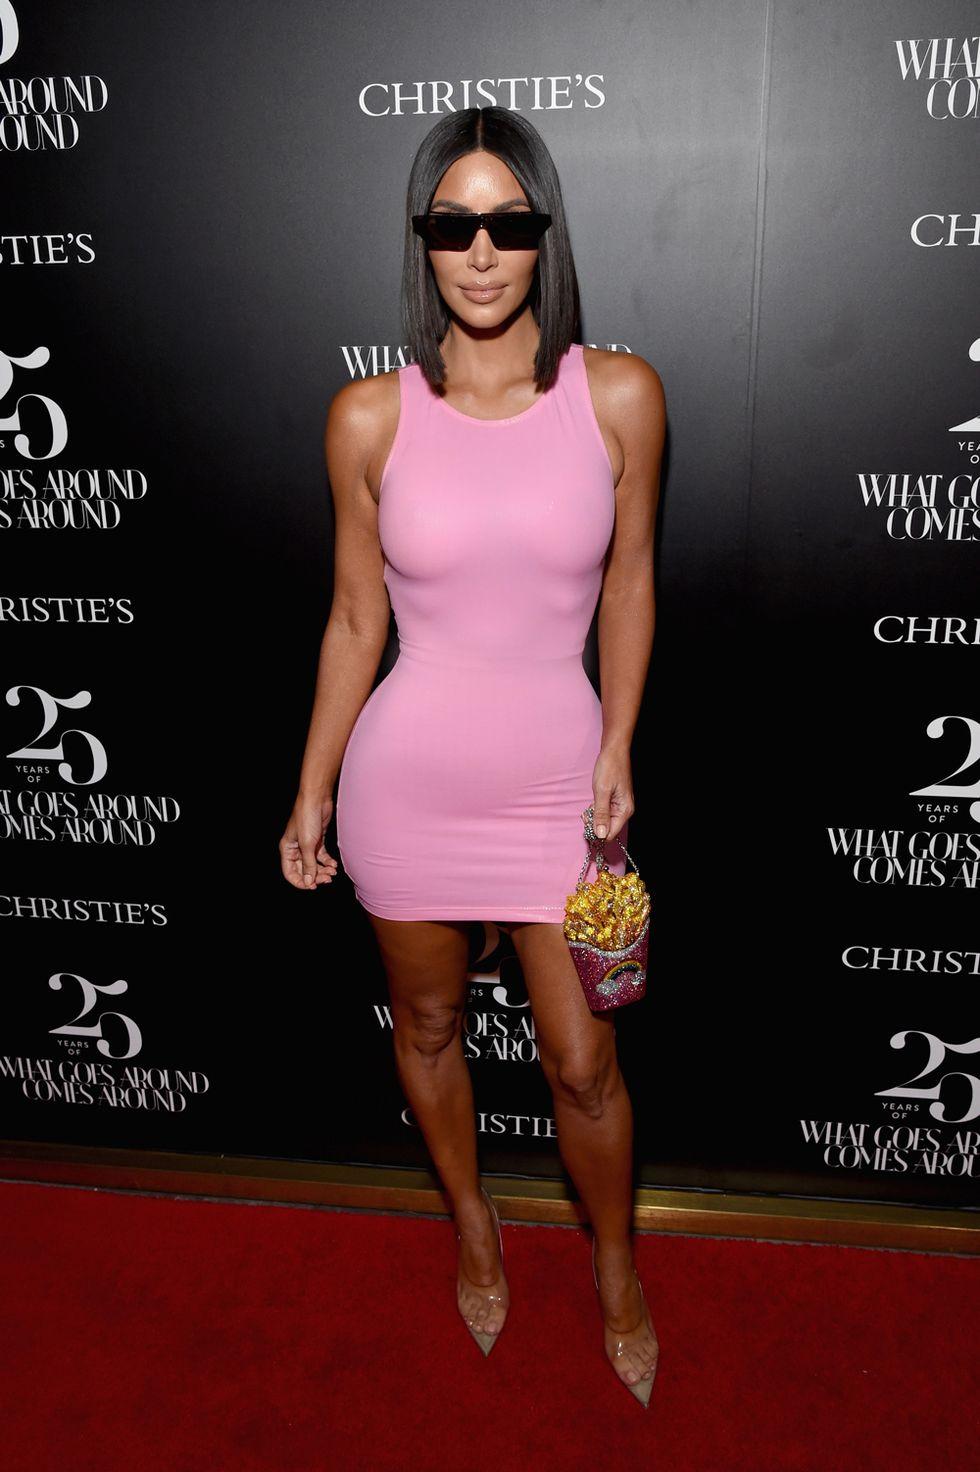 kim kardashian pink dress, CLOTHING, kim kardashian tight dress, where to buy kim kardashian dresses, kim kardashian outfits, kim kardashian new fashion style, kim kardashian style dresses for sale,